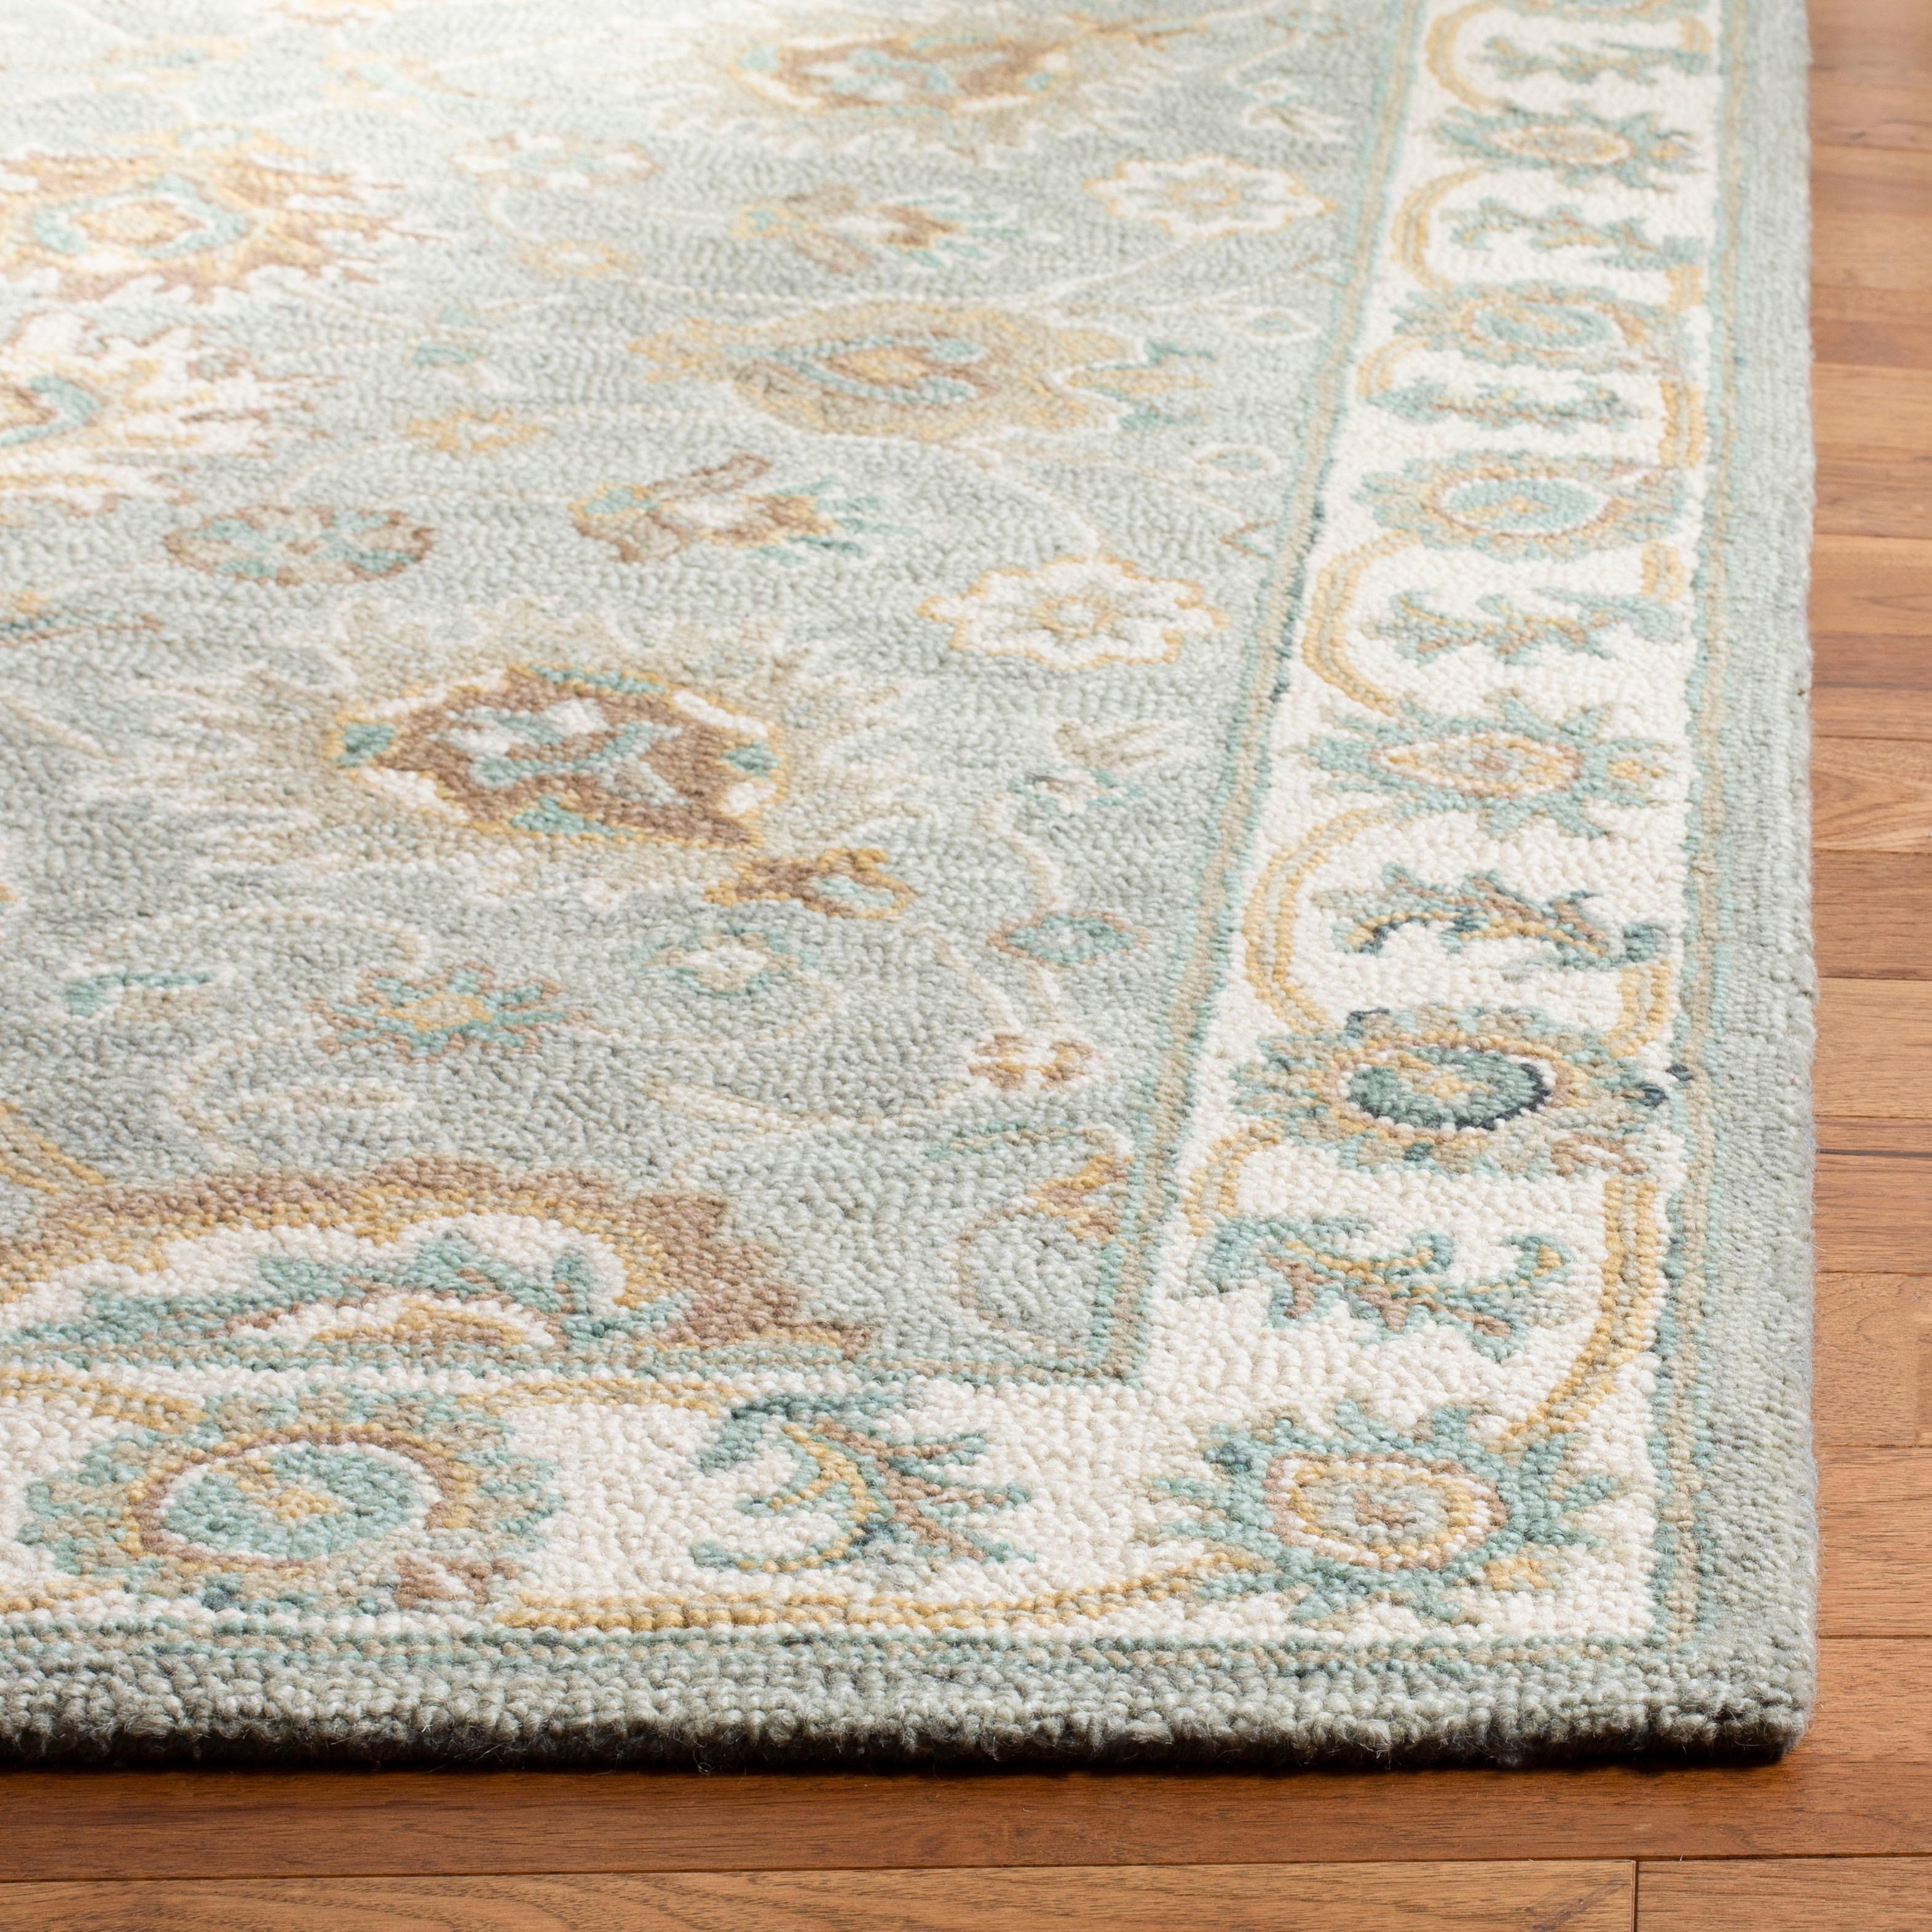 Safavieh Handmade Blossom Almyra Modern Floral Wool Rug Overstock 26288127